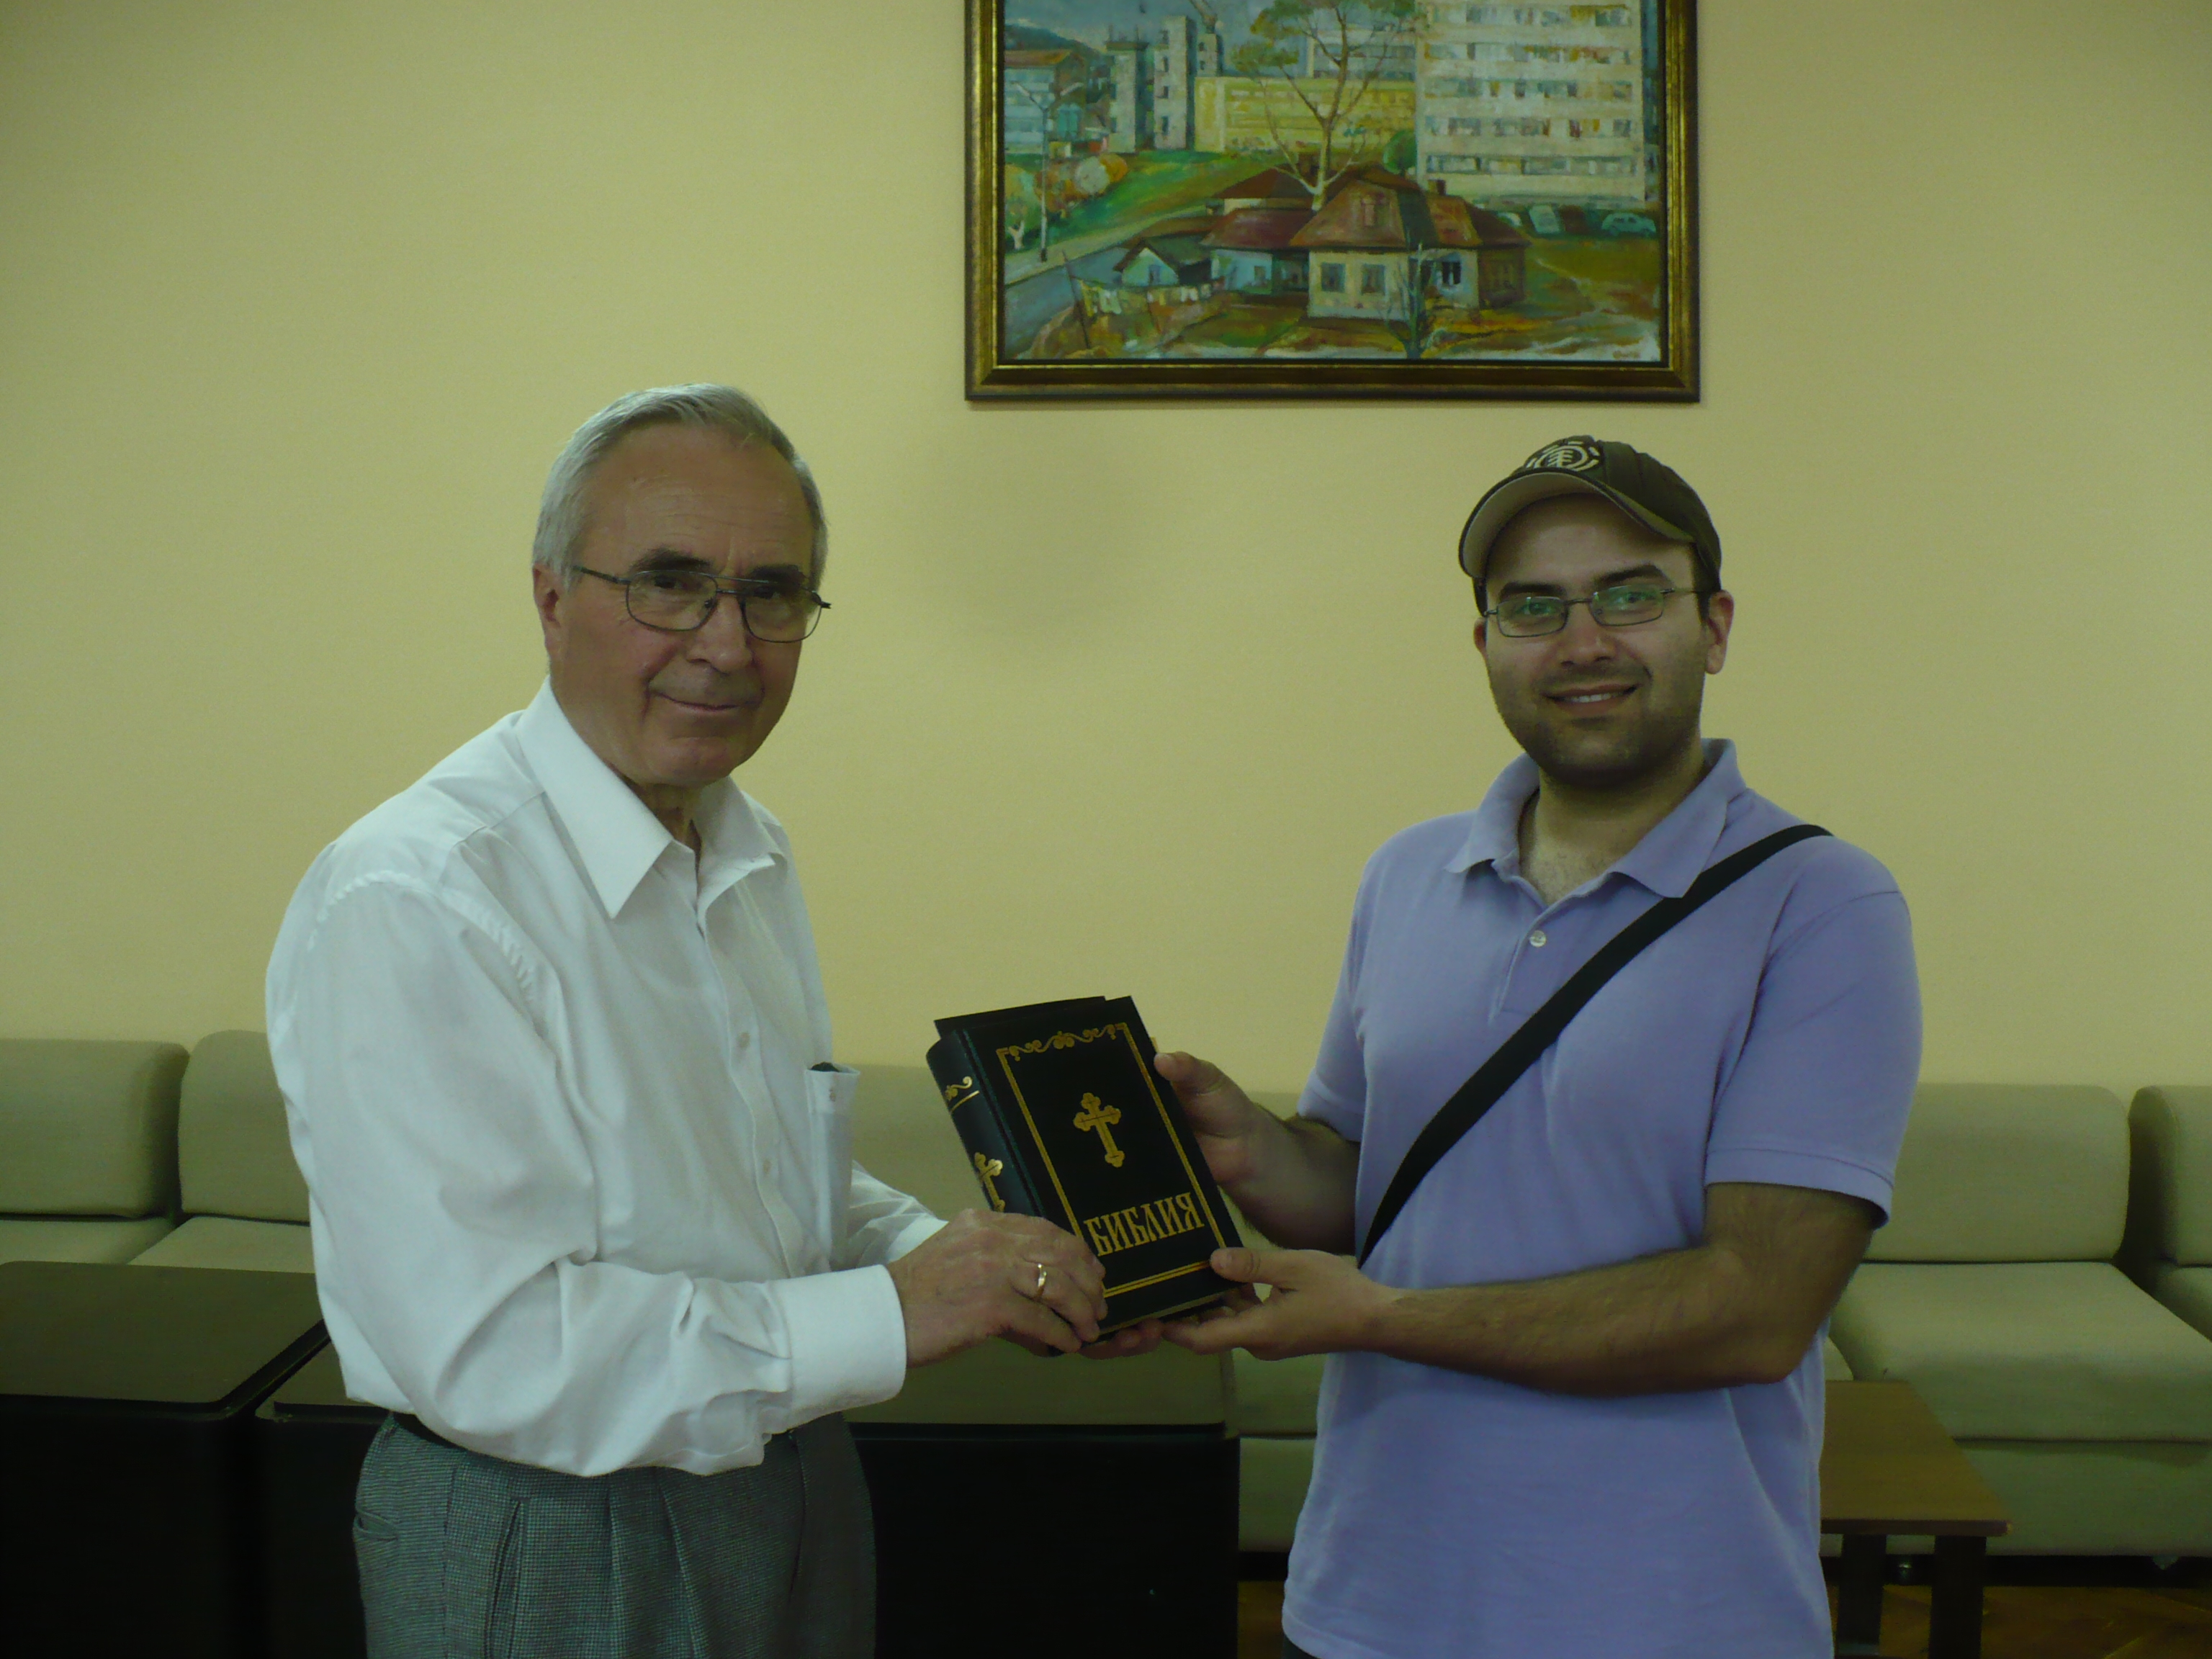 Дарени бяха 30 Библии на екипа на  Регионалната библиотека в Силистра